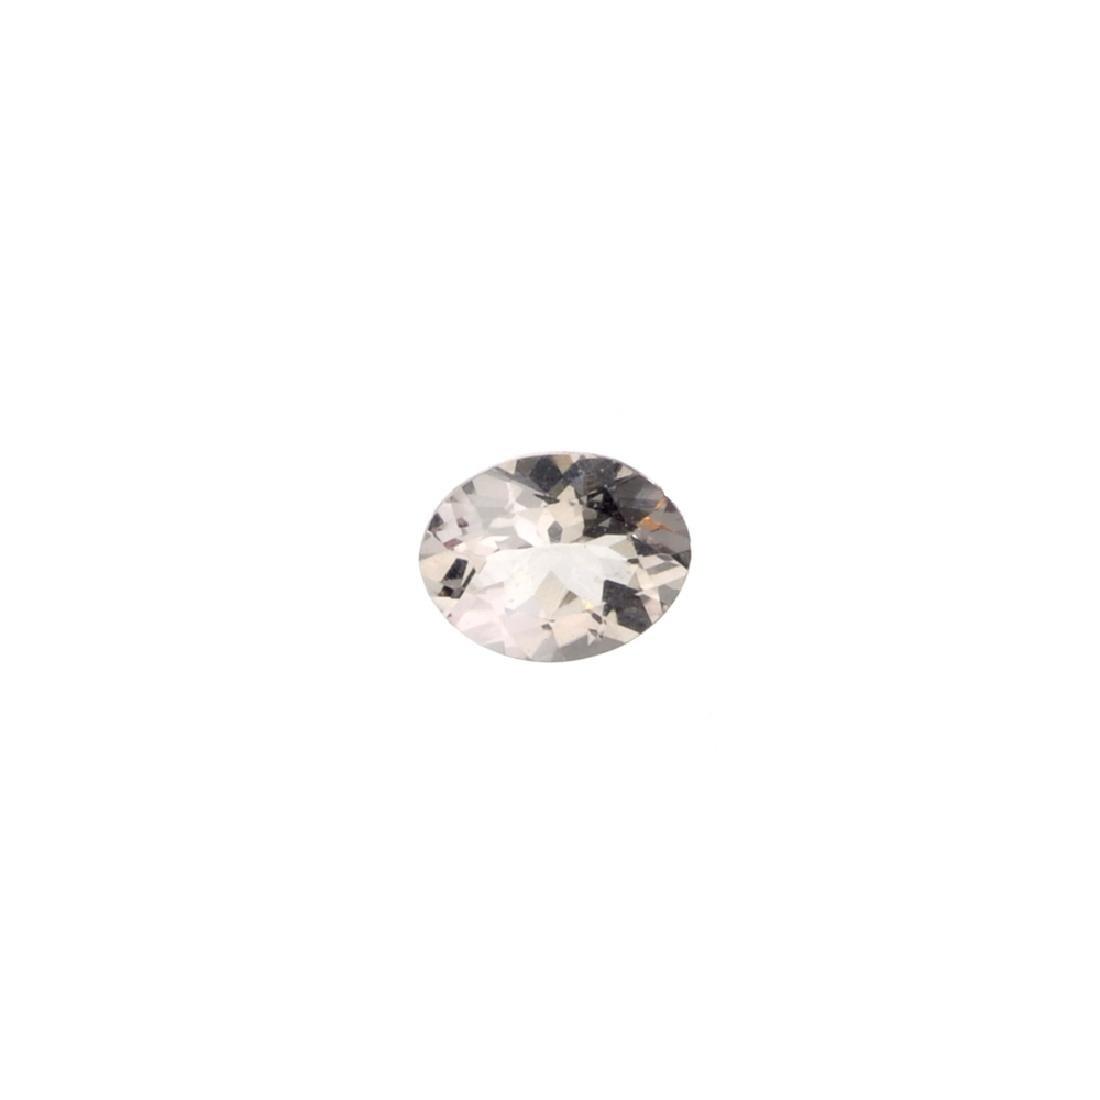 APP: 0.9k 1.34CT Oval Cut Morganite Gemstone